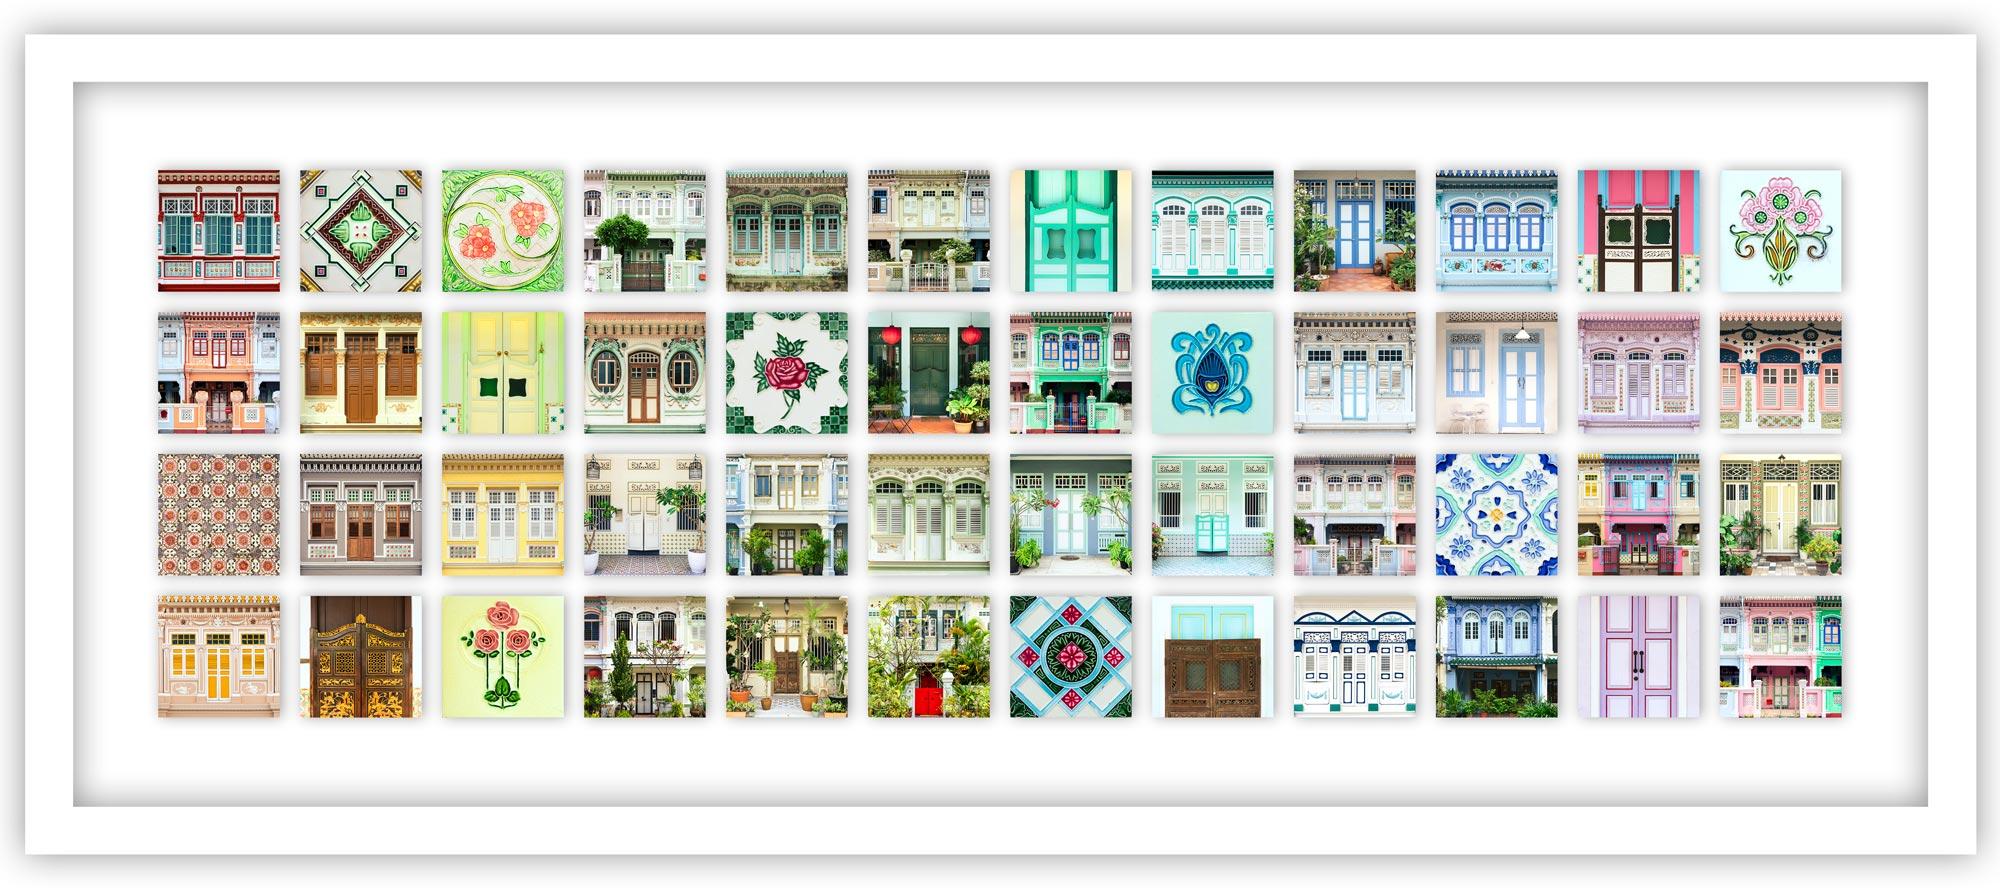 Singapore peranakan shophouses collage